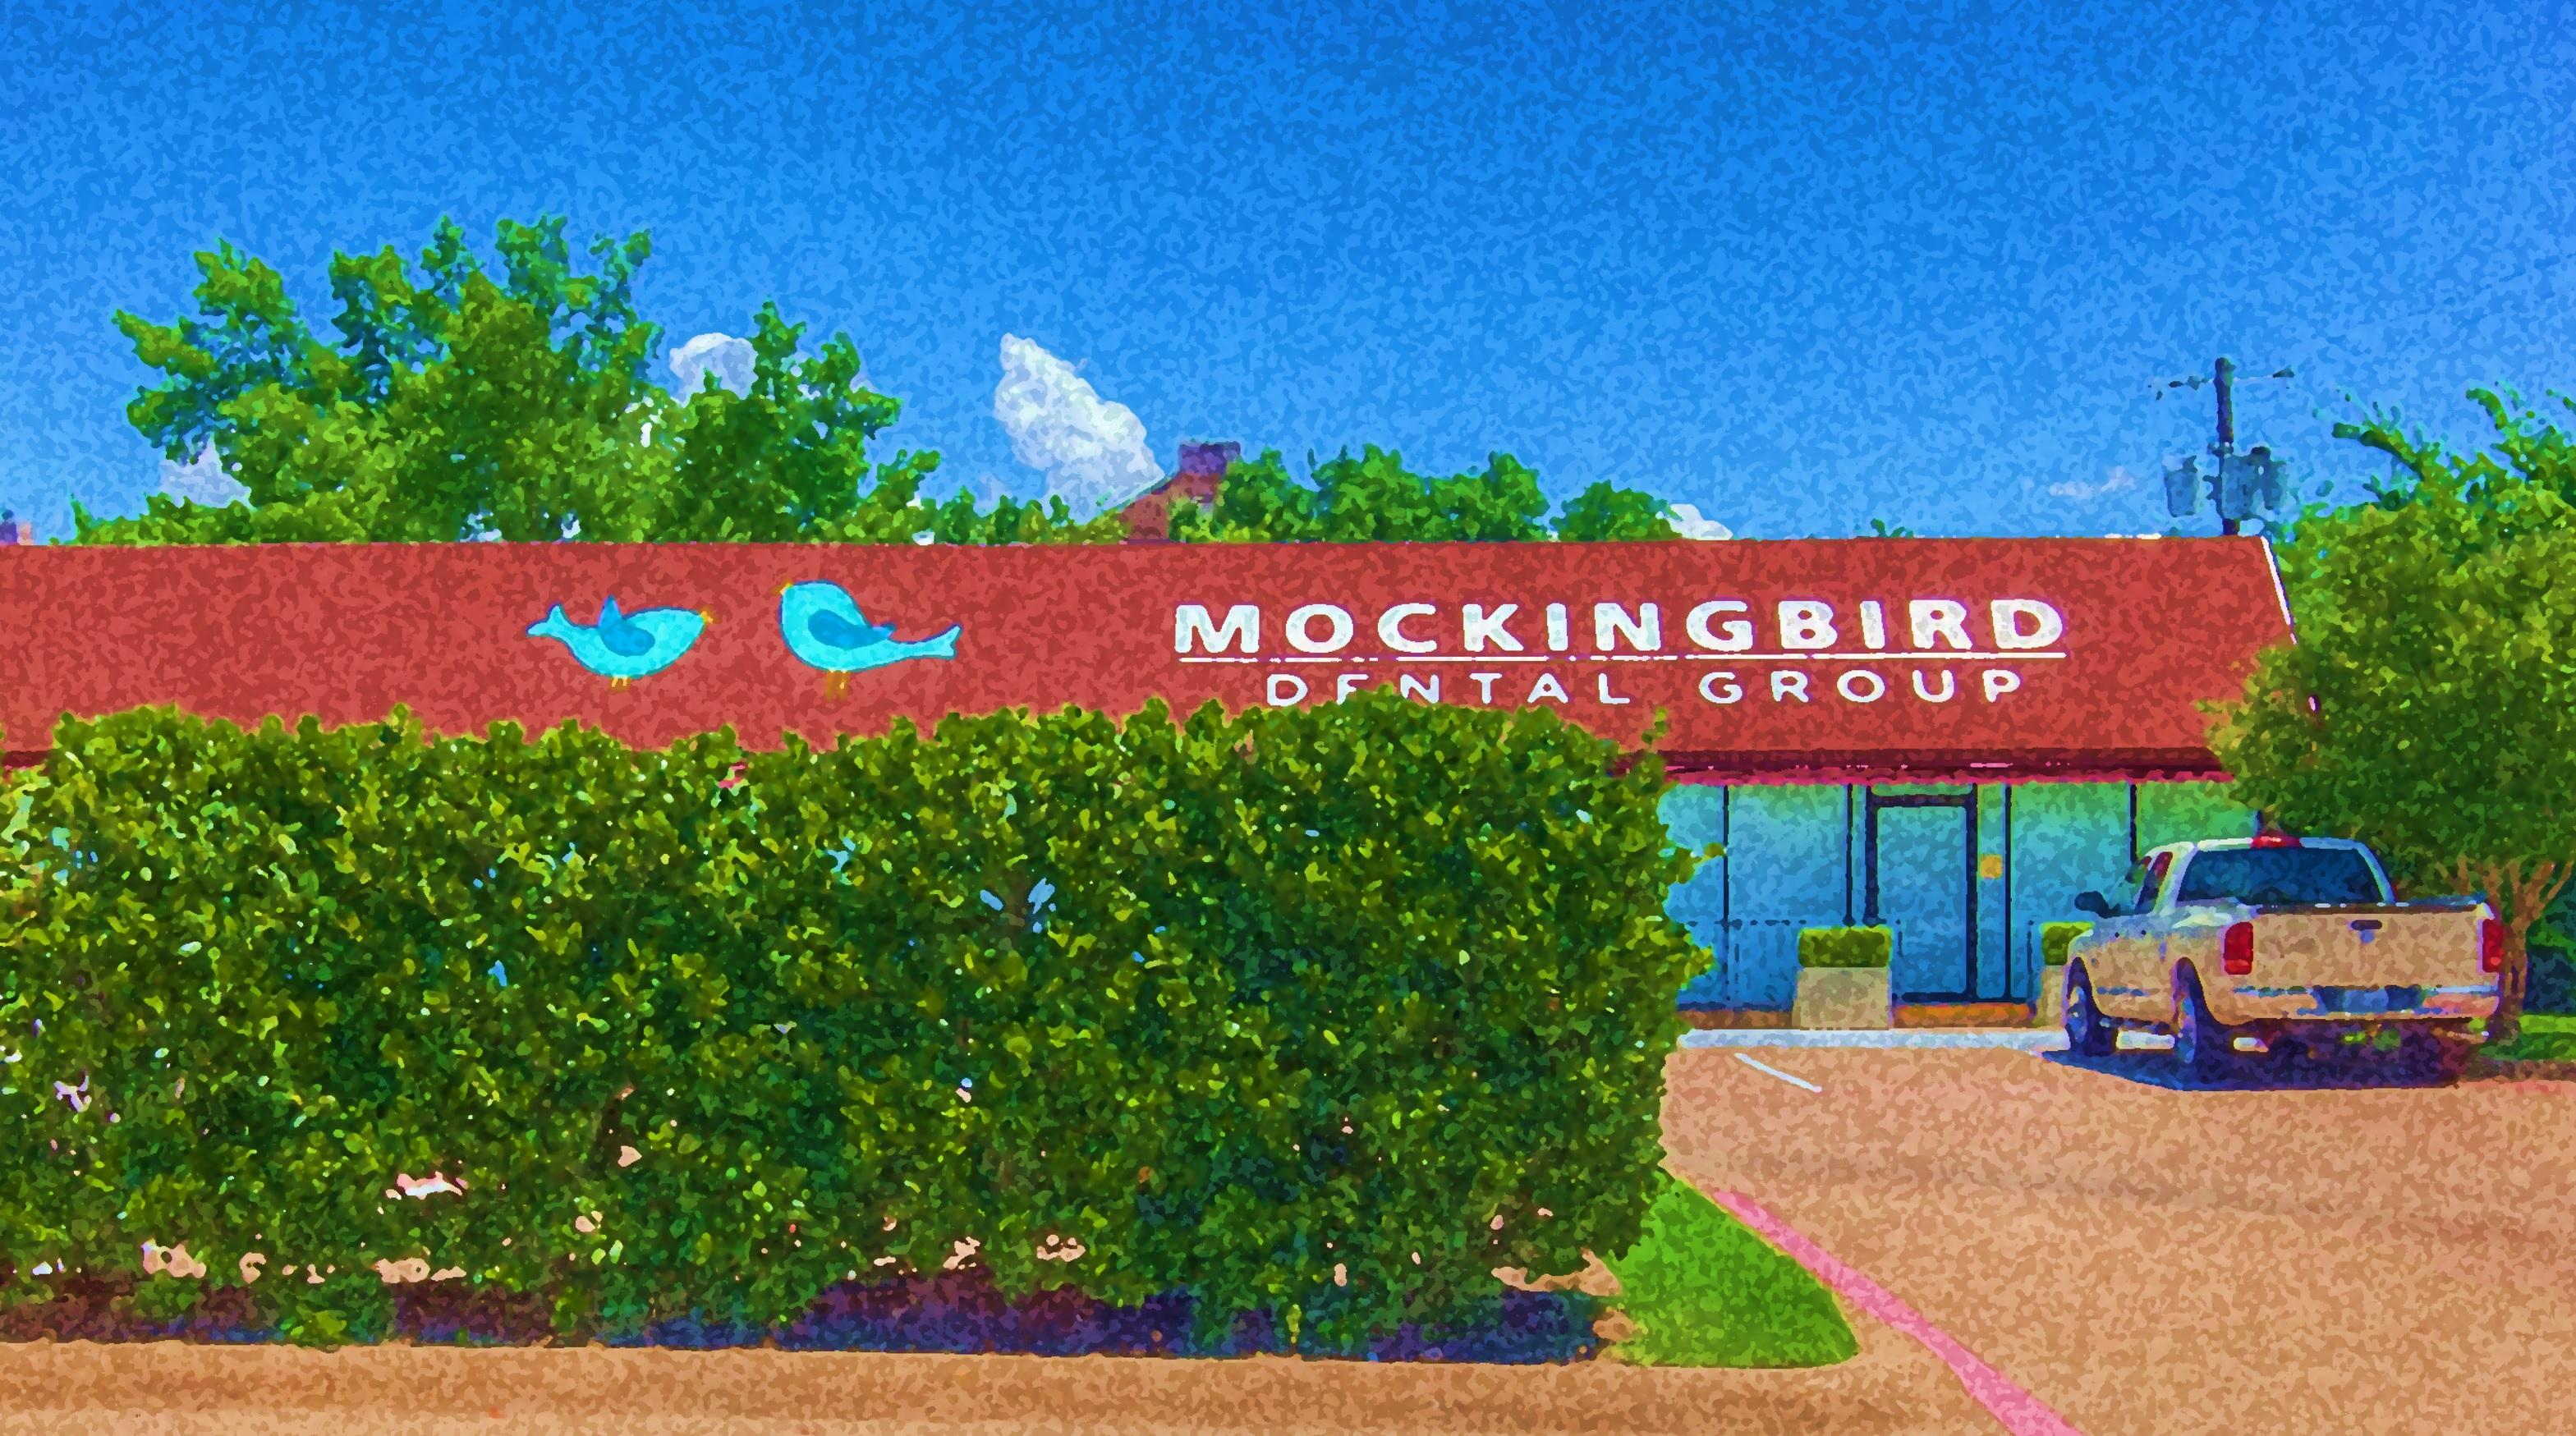 Mockingbird Dental Group